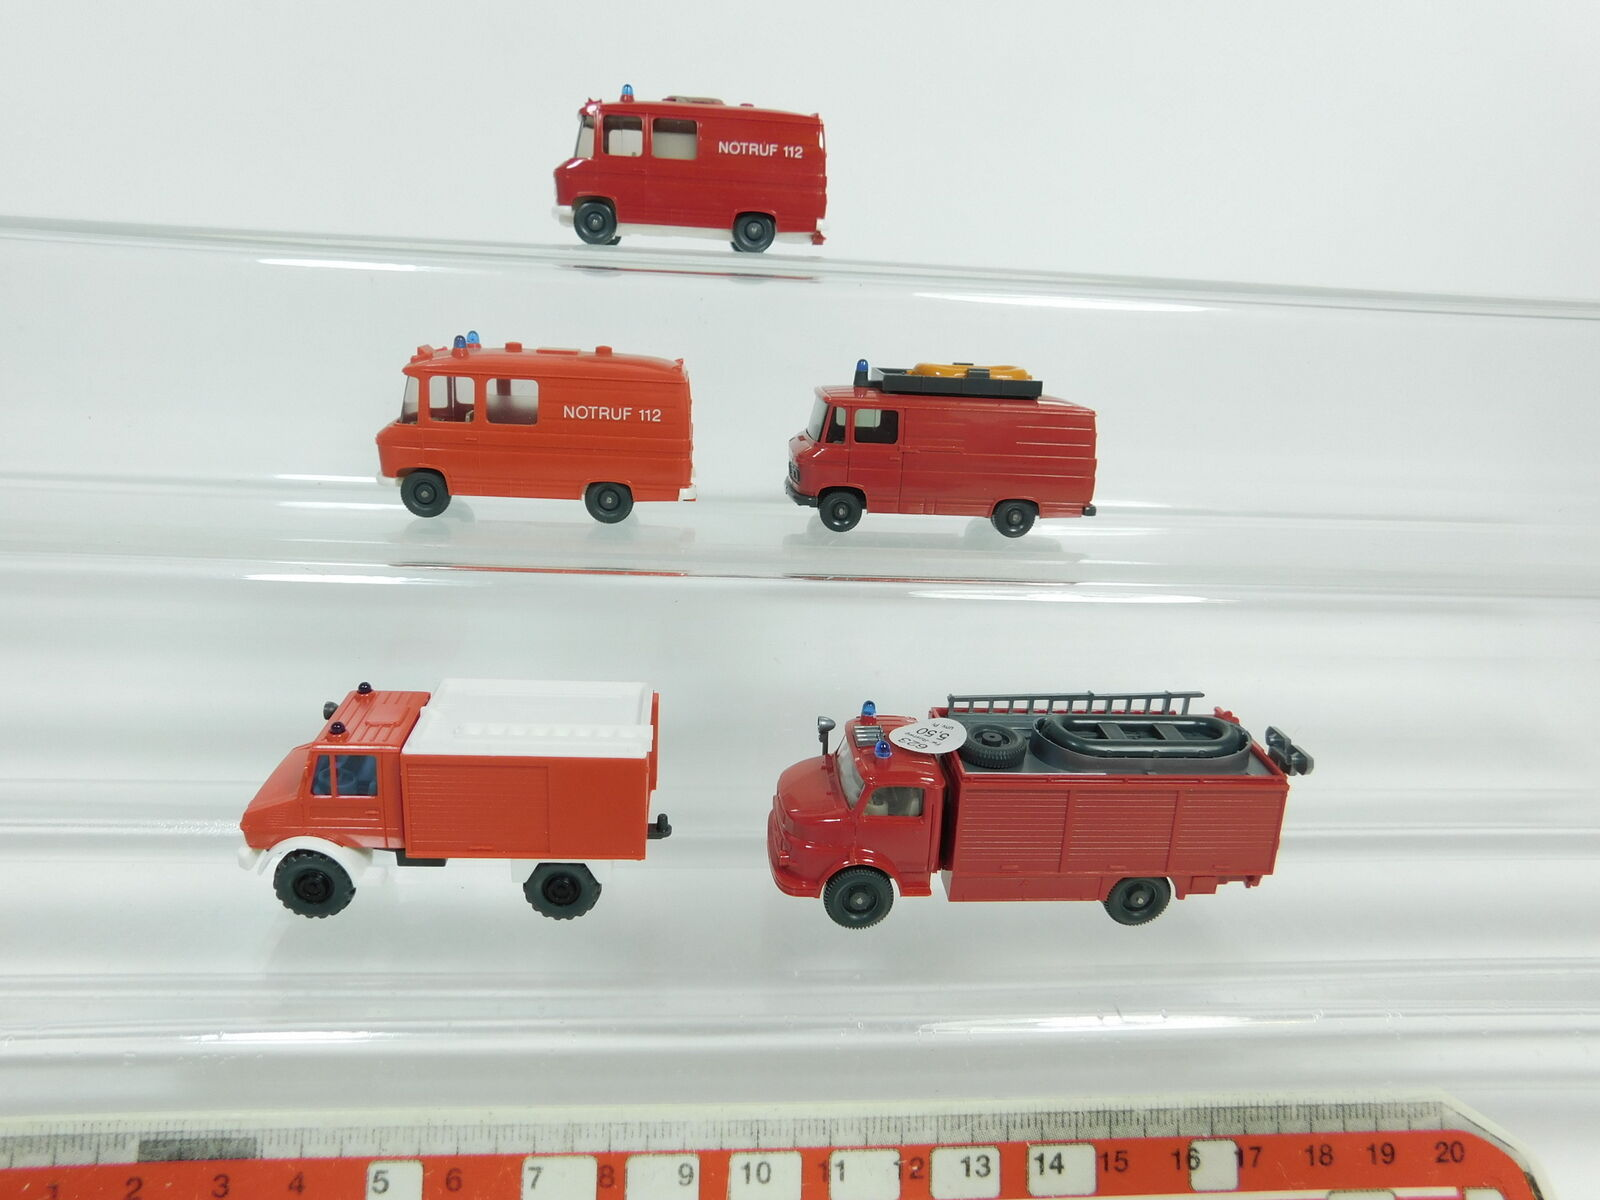 BD352-0,5x Wiking H0 1 87 MB-Modell Feuerwehr FW    Unimog+608+623 etc, NEUW 7b6429